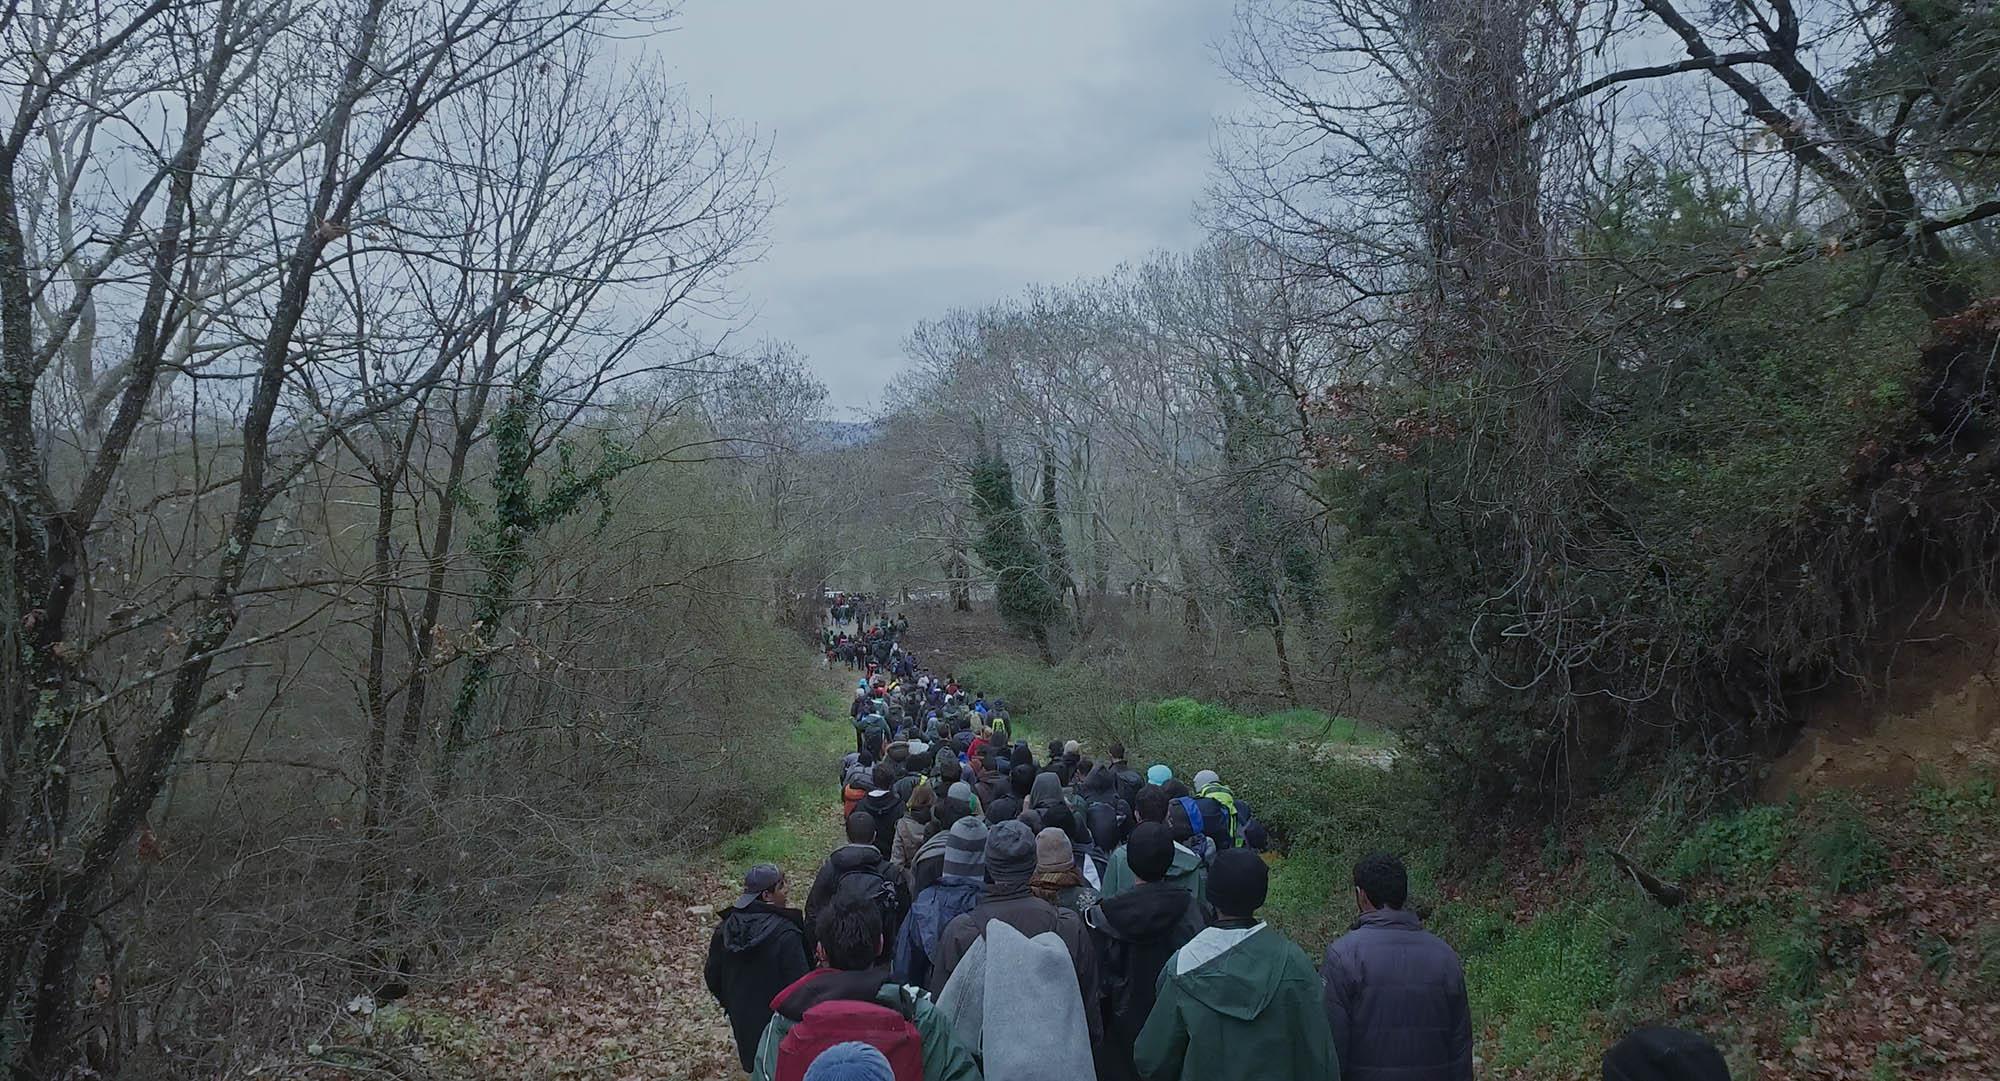 Refugees walking near Idomeni Camp, Greece in HUMAN FLOW, an Amazon Studios release. Photo courtesy of Amazon Studios.